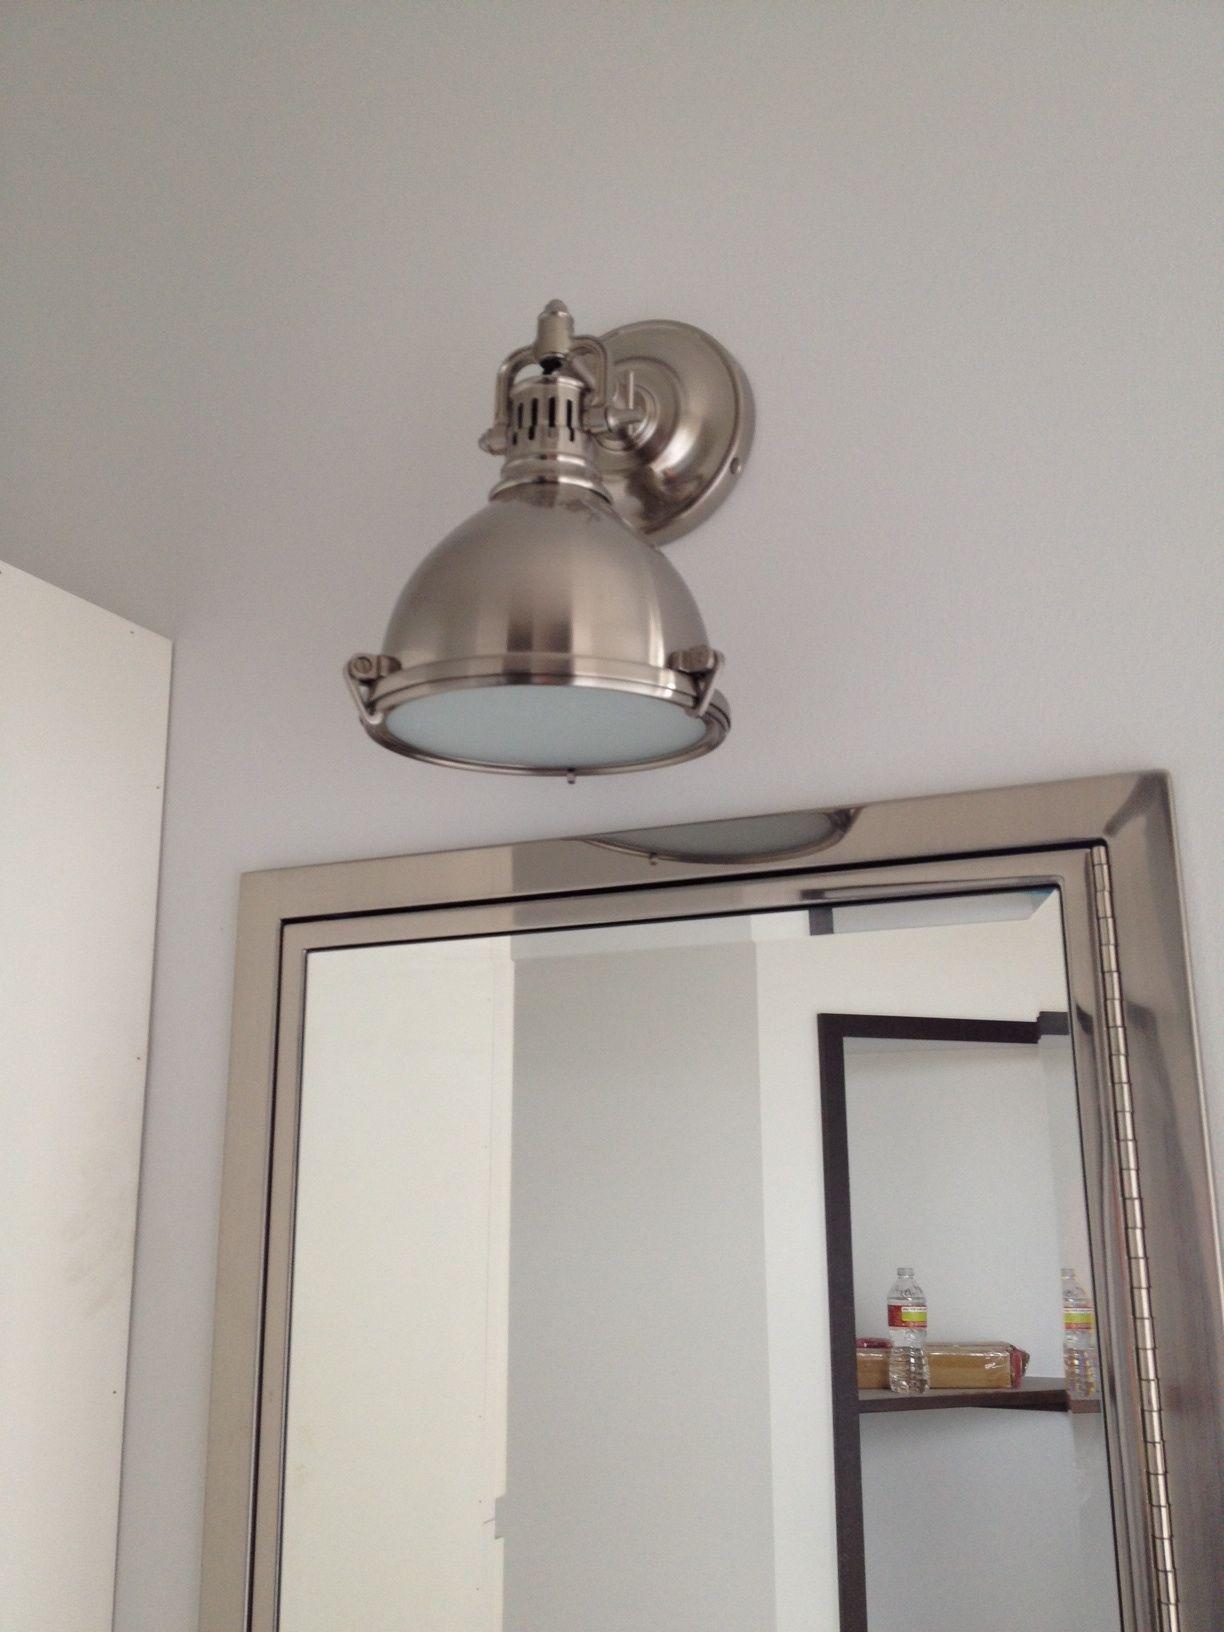 nautical bathroom lights. Nautical LIGHTING | Influence For A Coastal-inspired Home Bathroom Lights I